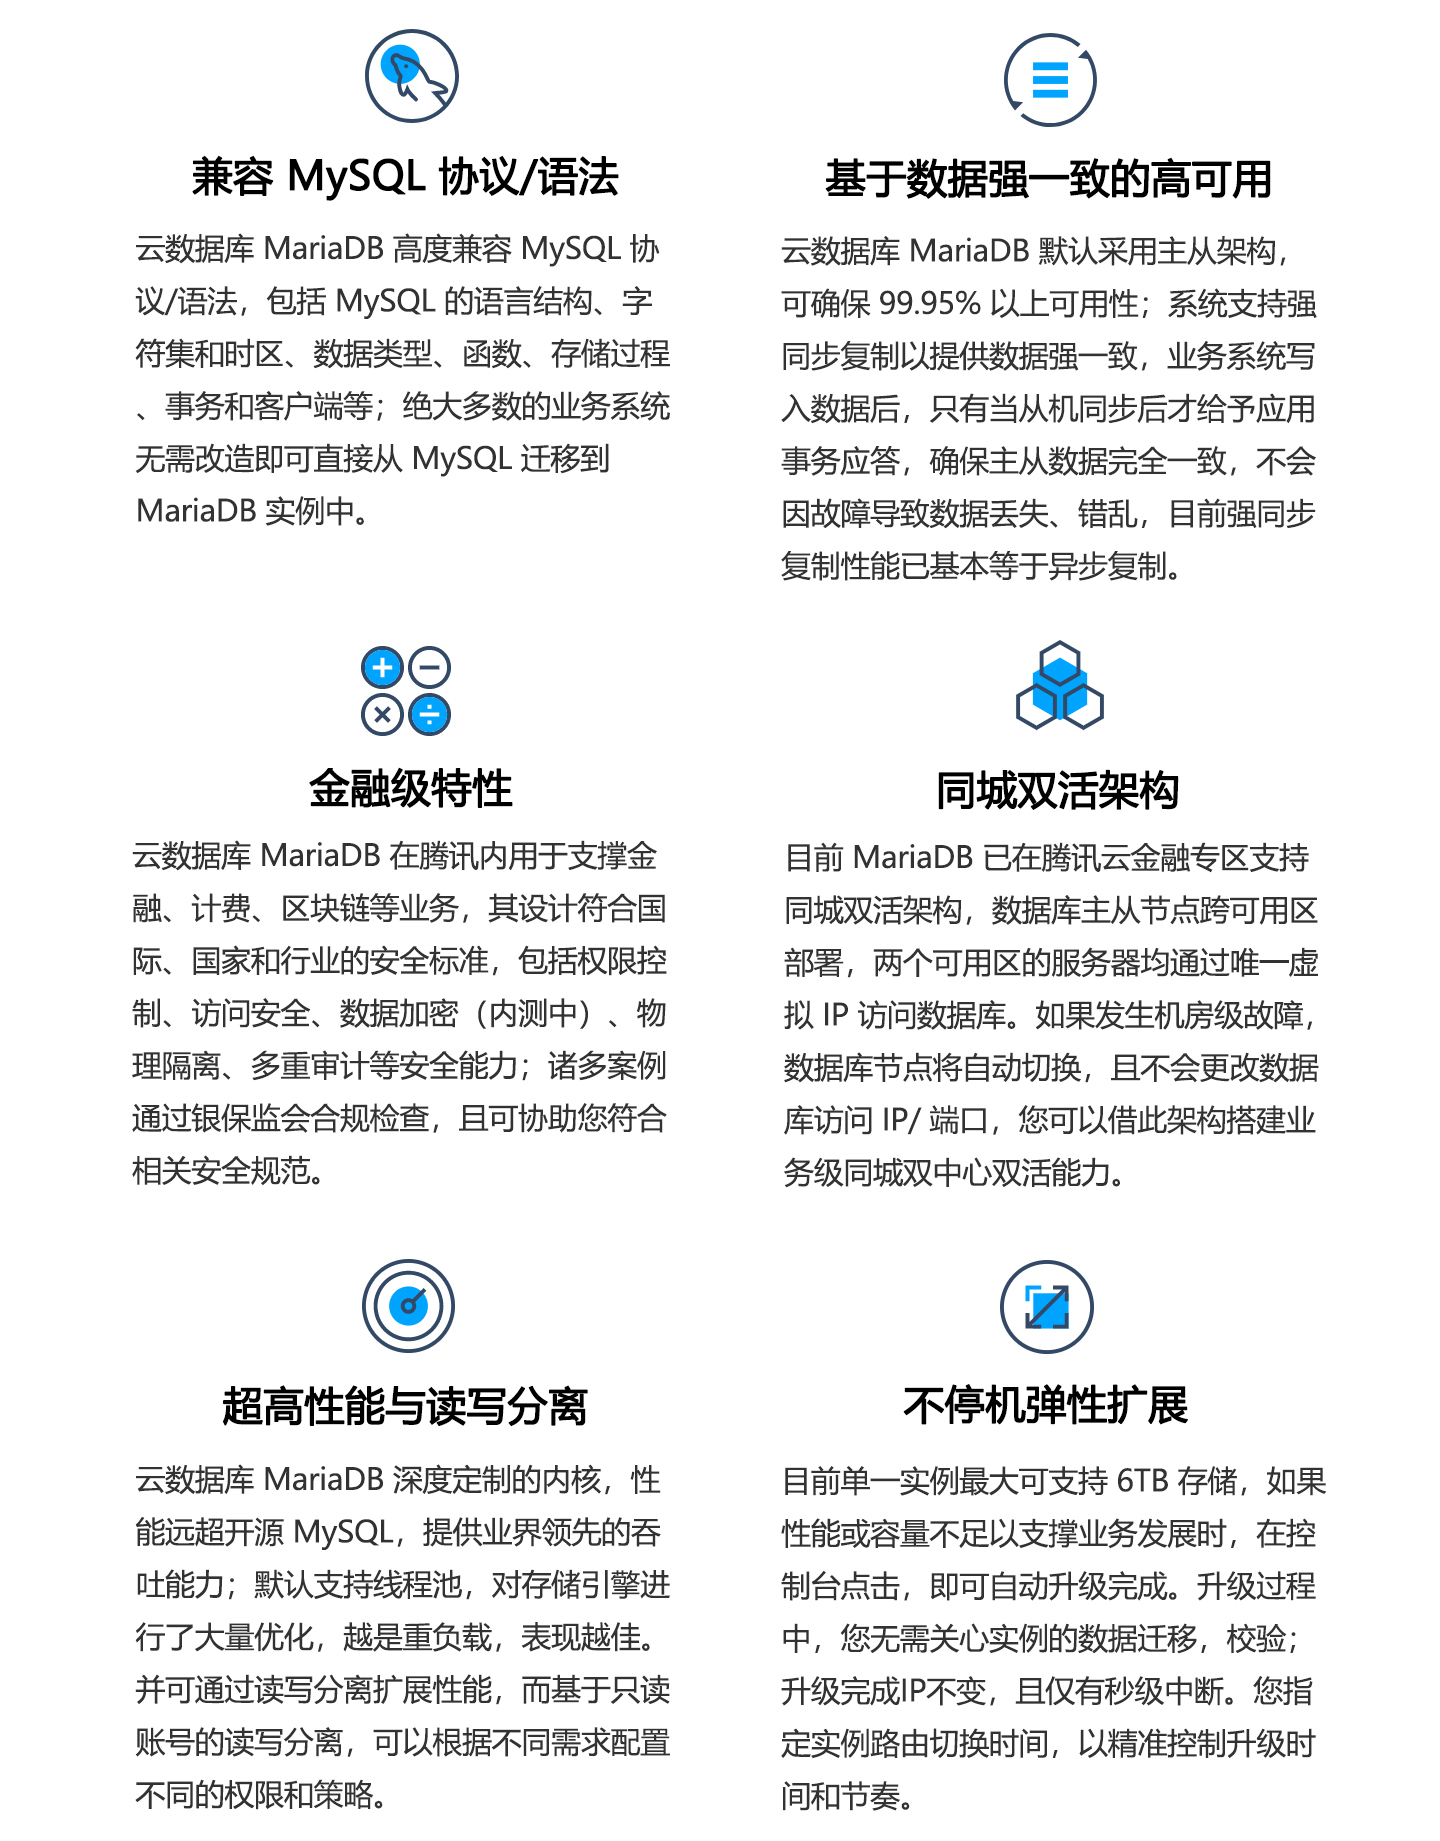 云数据库-TencentDB-for-MariaDB-1440_02.jpg